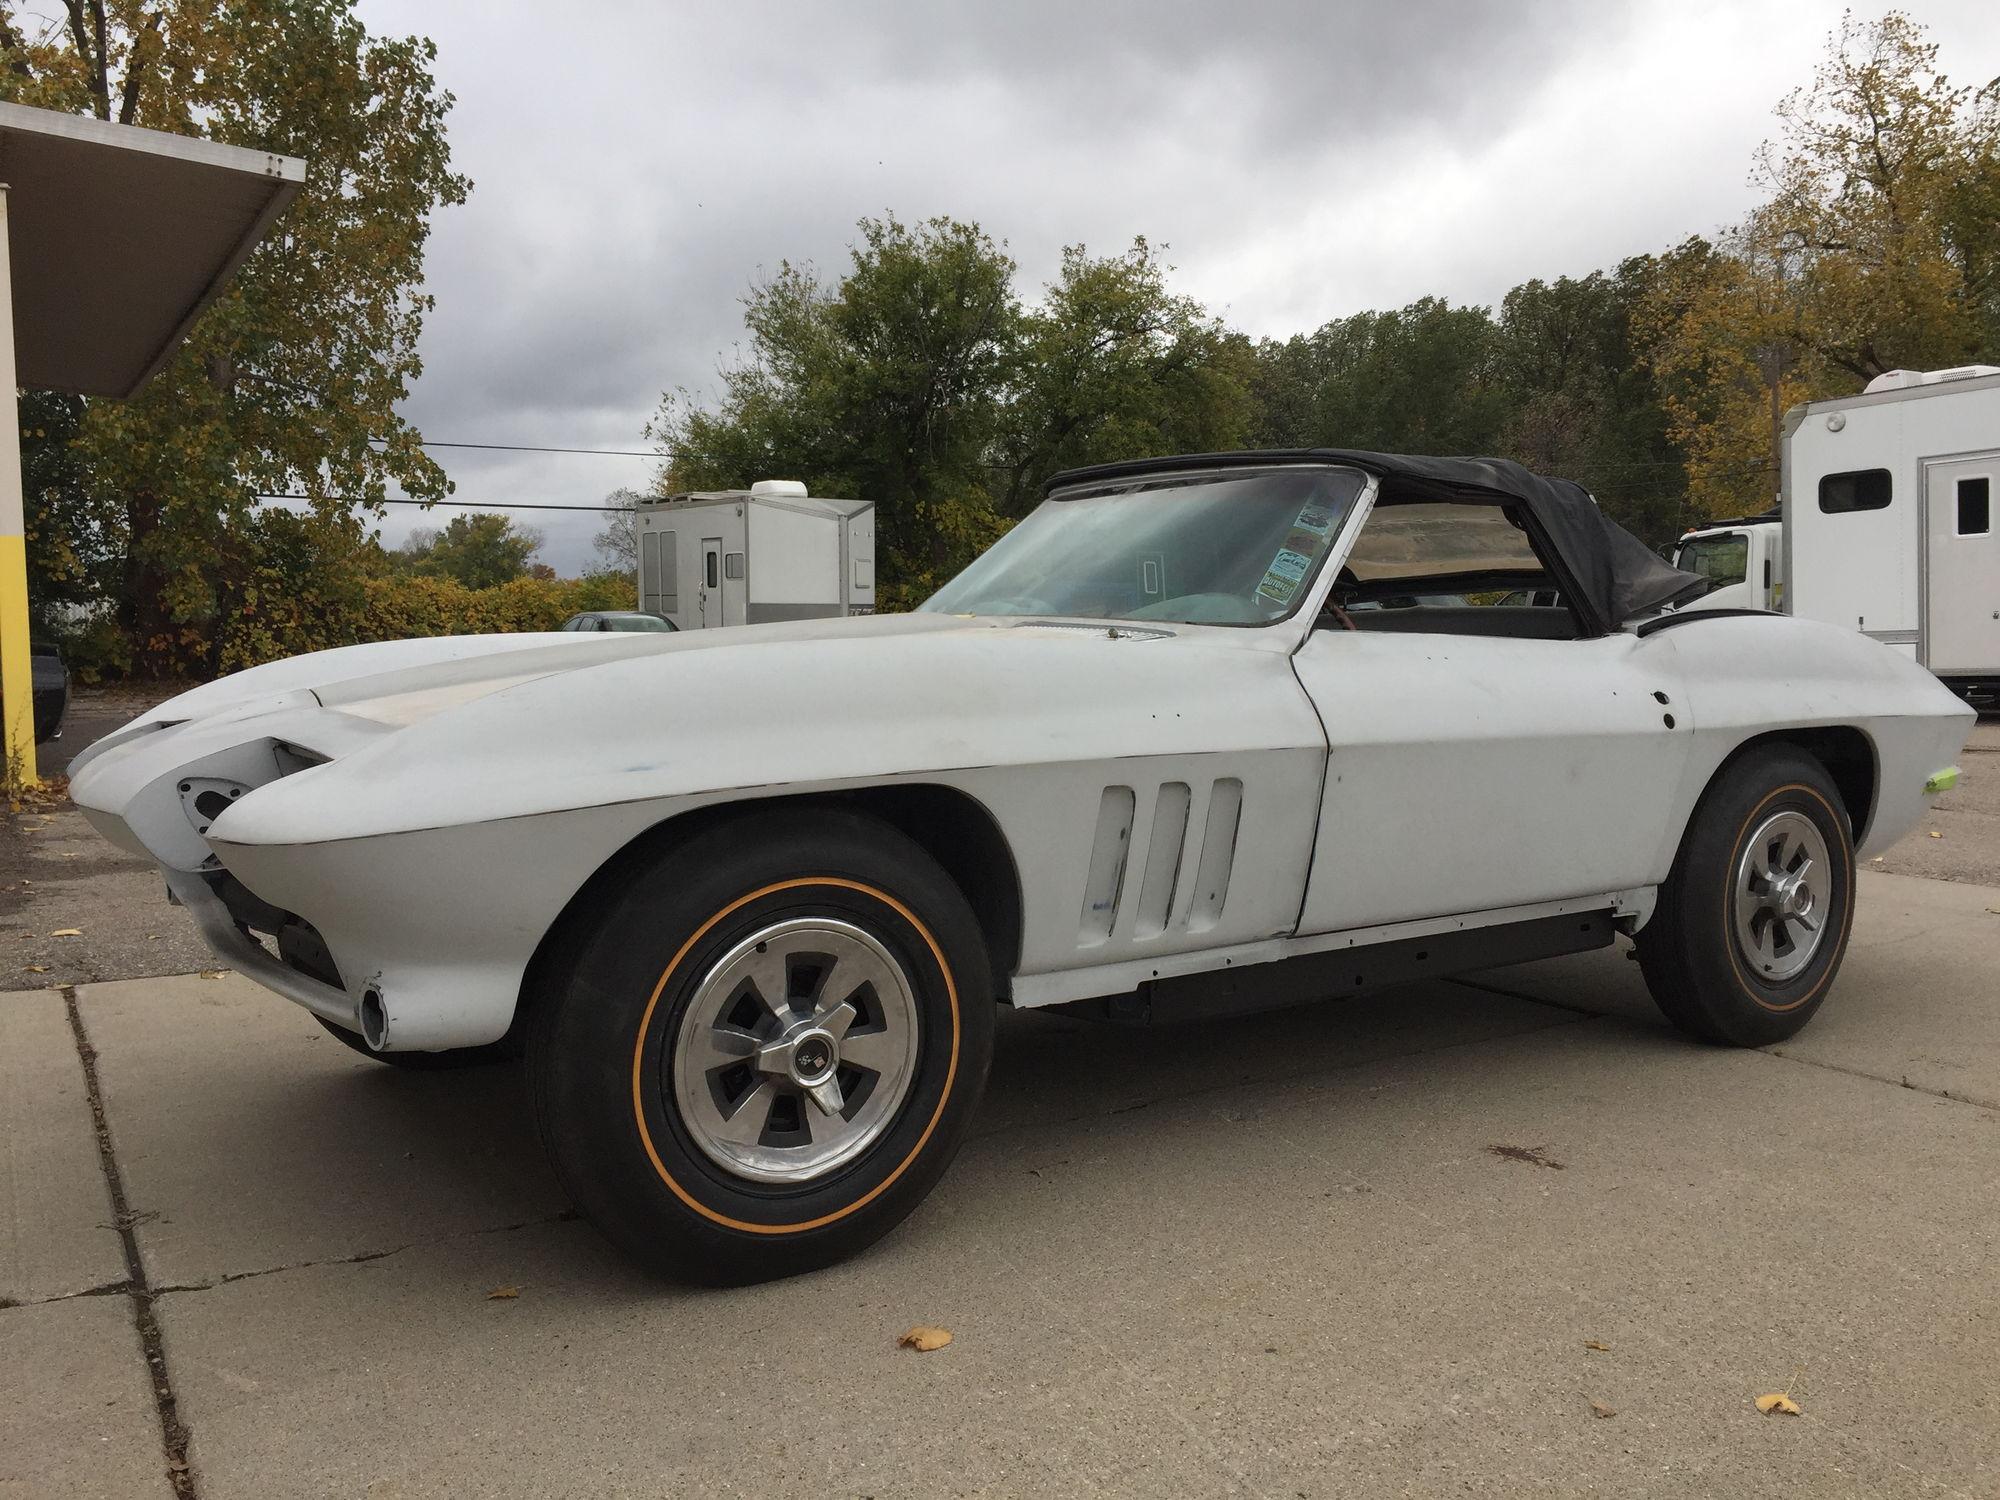 fs for sale 1965 corvette convertible 4 speed partially restored in michigan corvetteforum. Black Bedroom Furniture Sets. Home Design Ideas